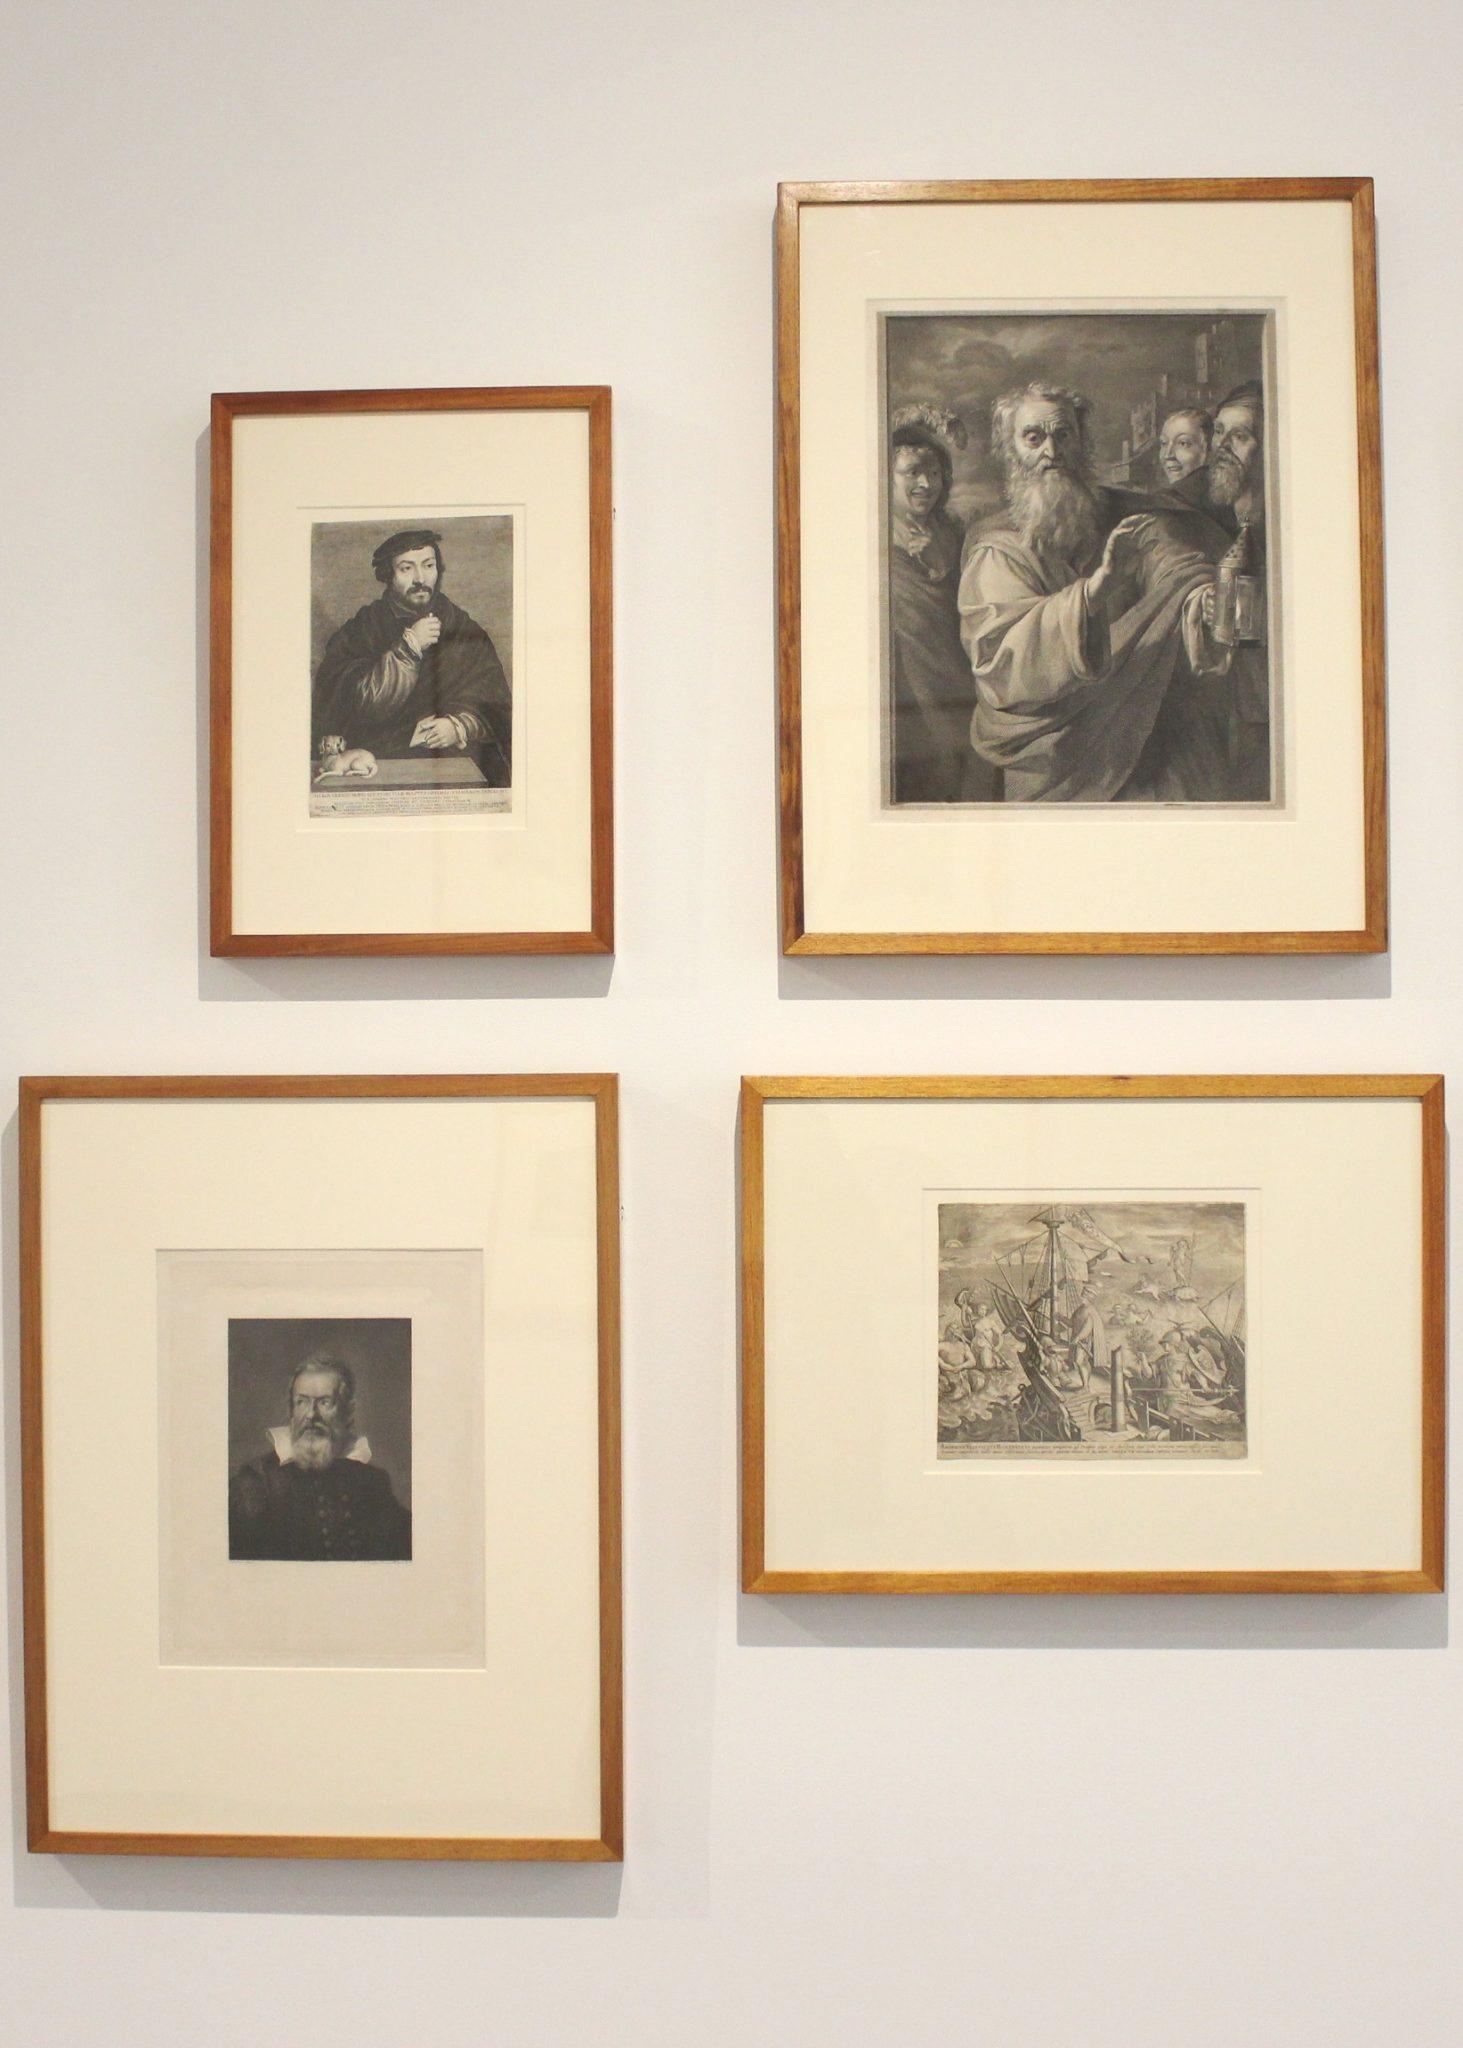 Exhibition installation, Latrobe Regional Gallery